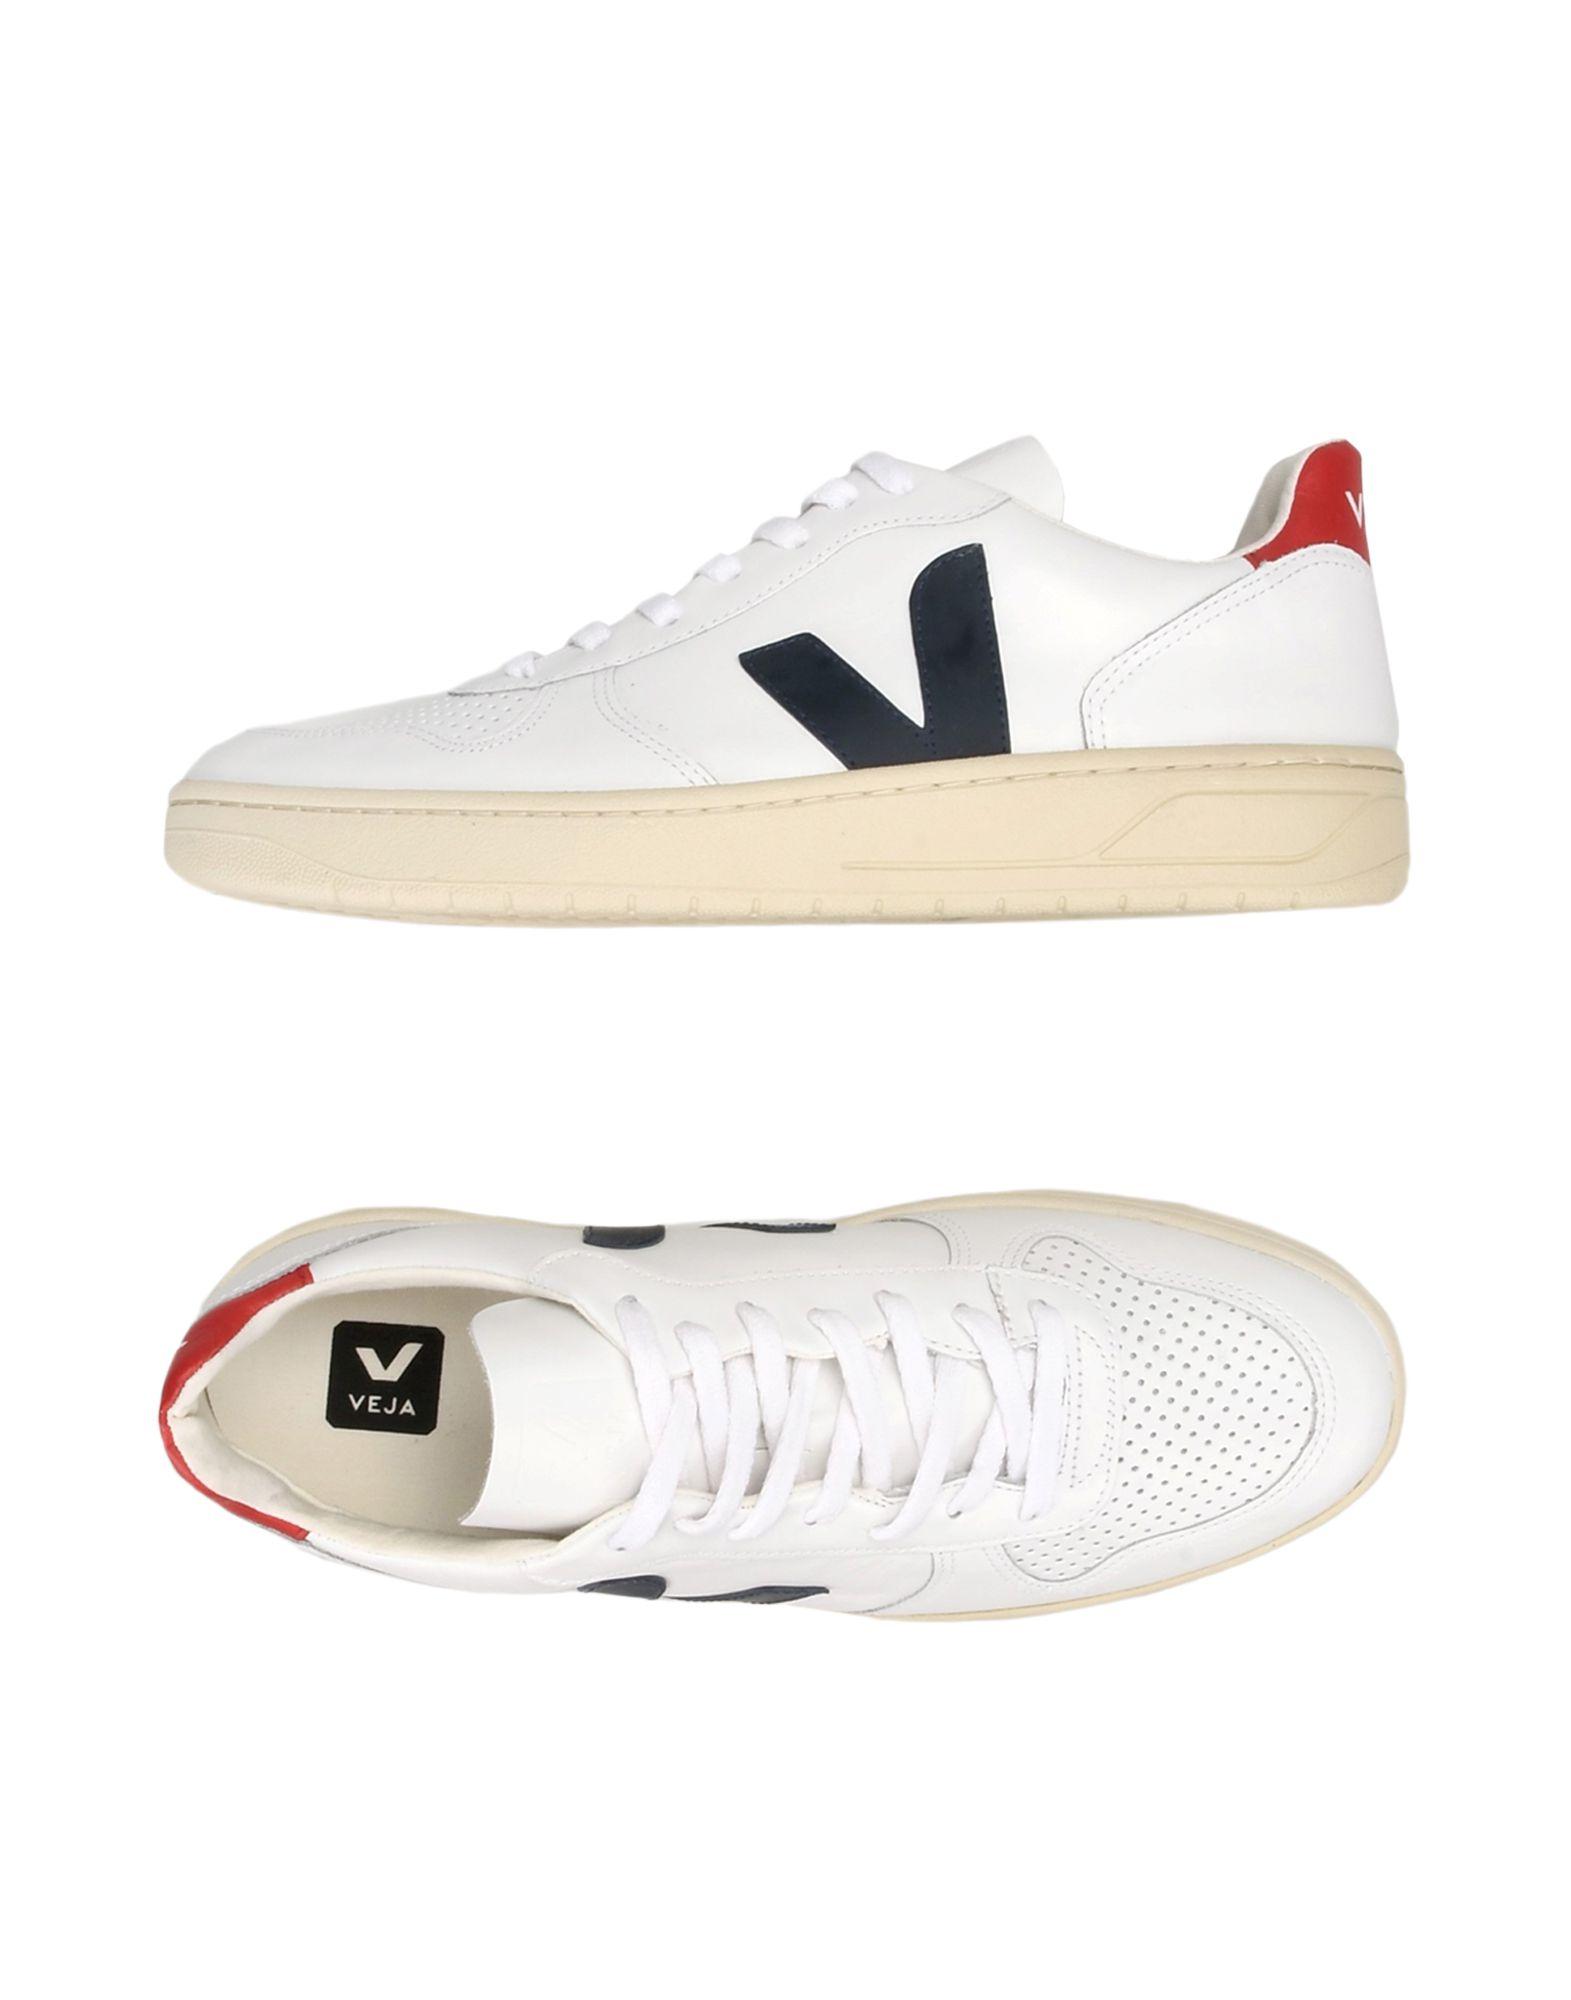 Veja Sneakers - Men Men Men Veja Sneakers online on  Canada - 11306294UL 281a17